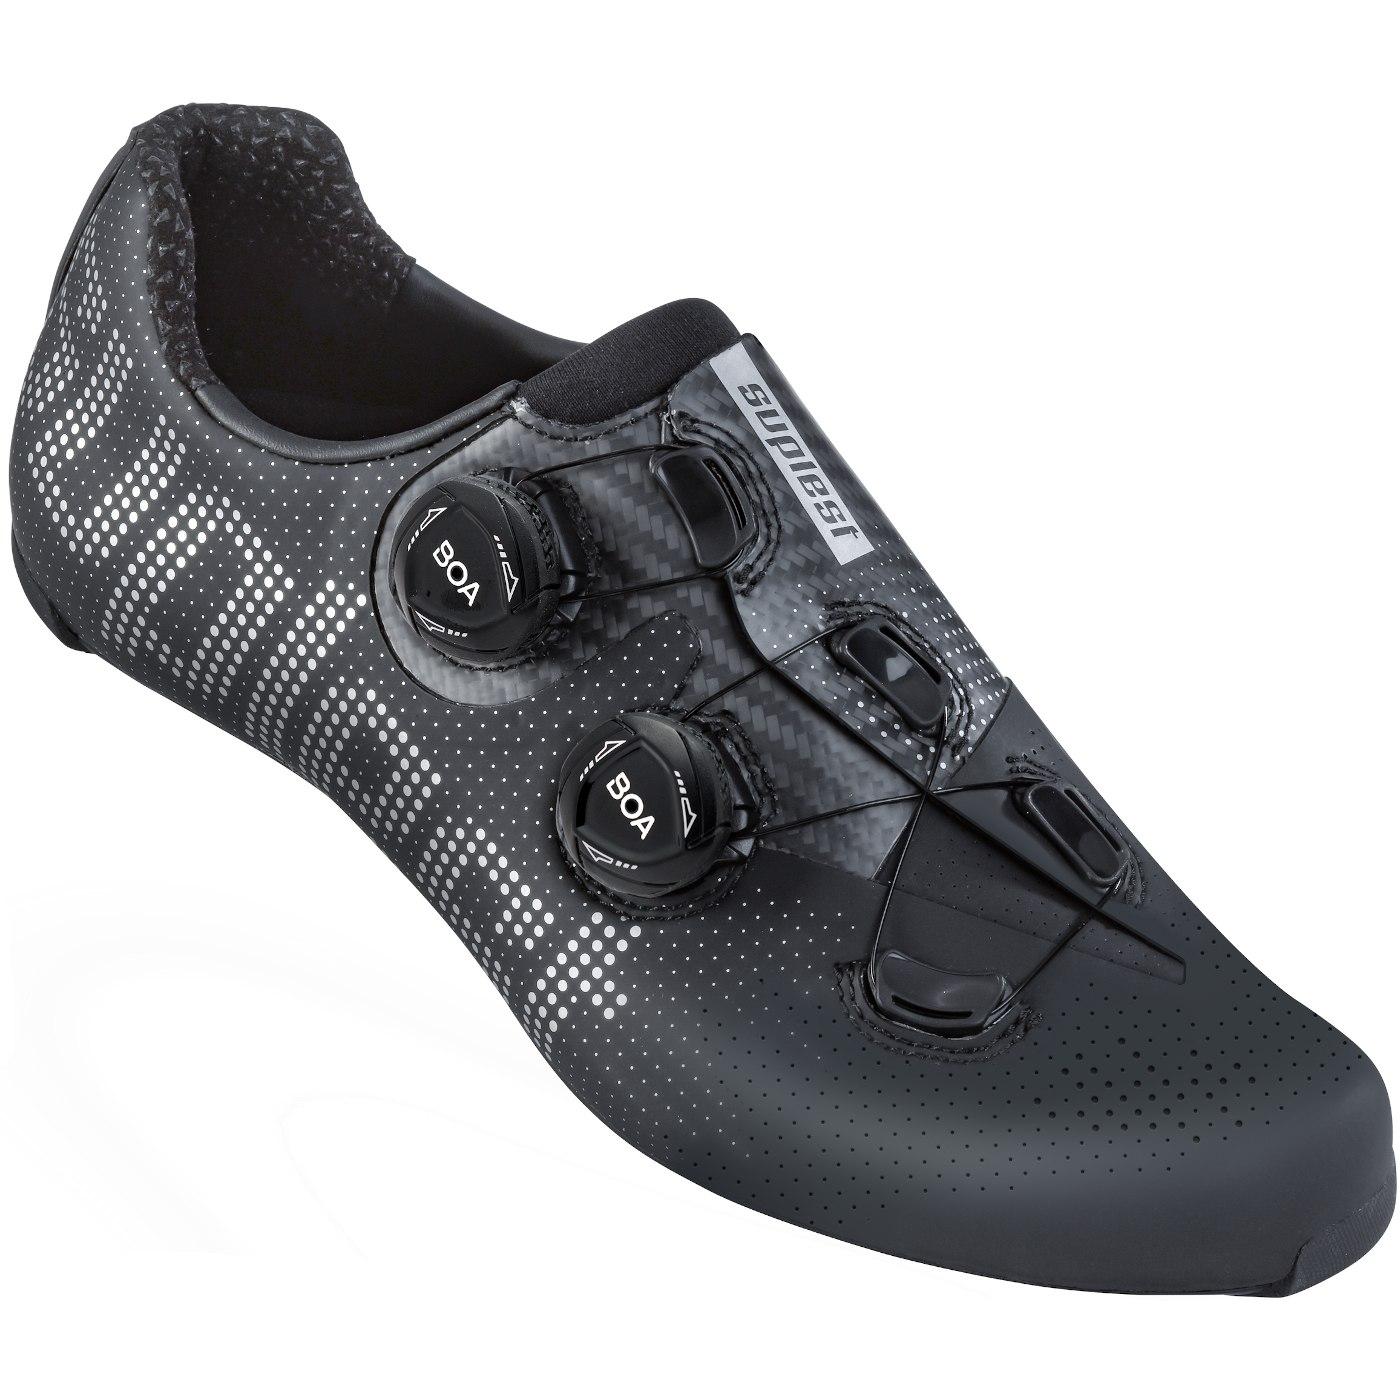 Suplest EDGE+ Double BOA IP1 Road Pro Shoe - Black / Silver 01.063.